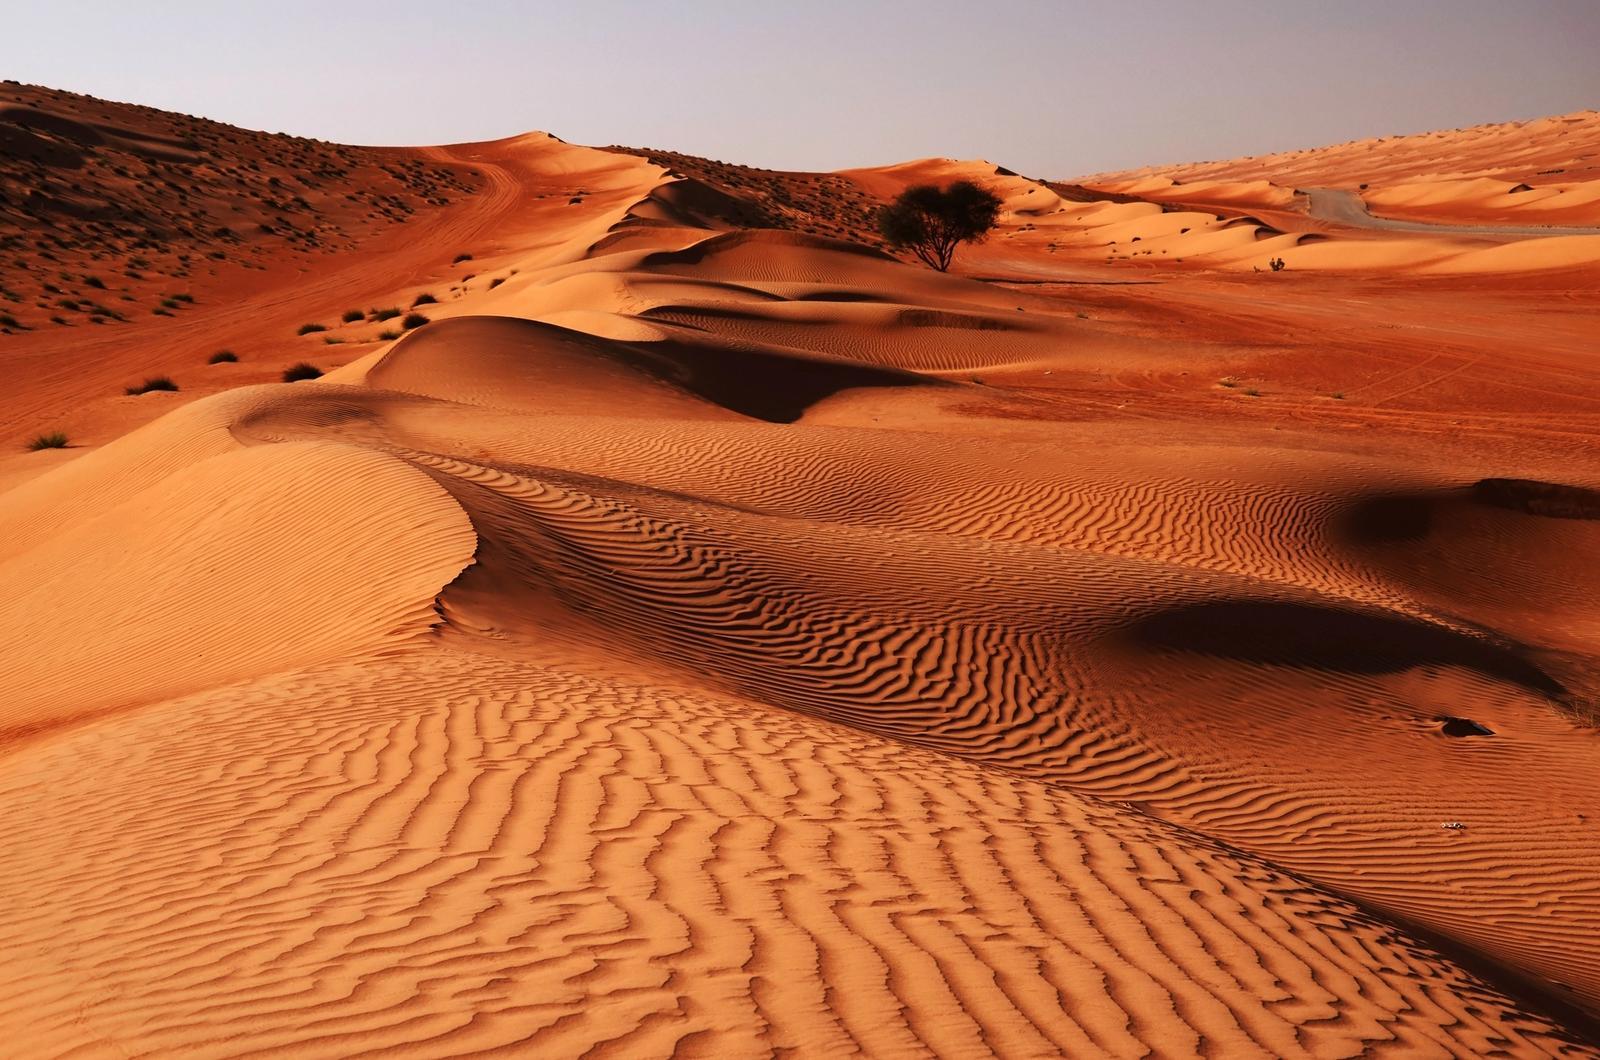 Deserto rosso in Oman